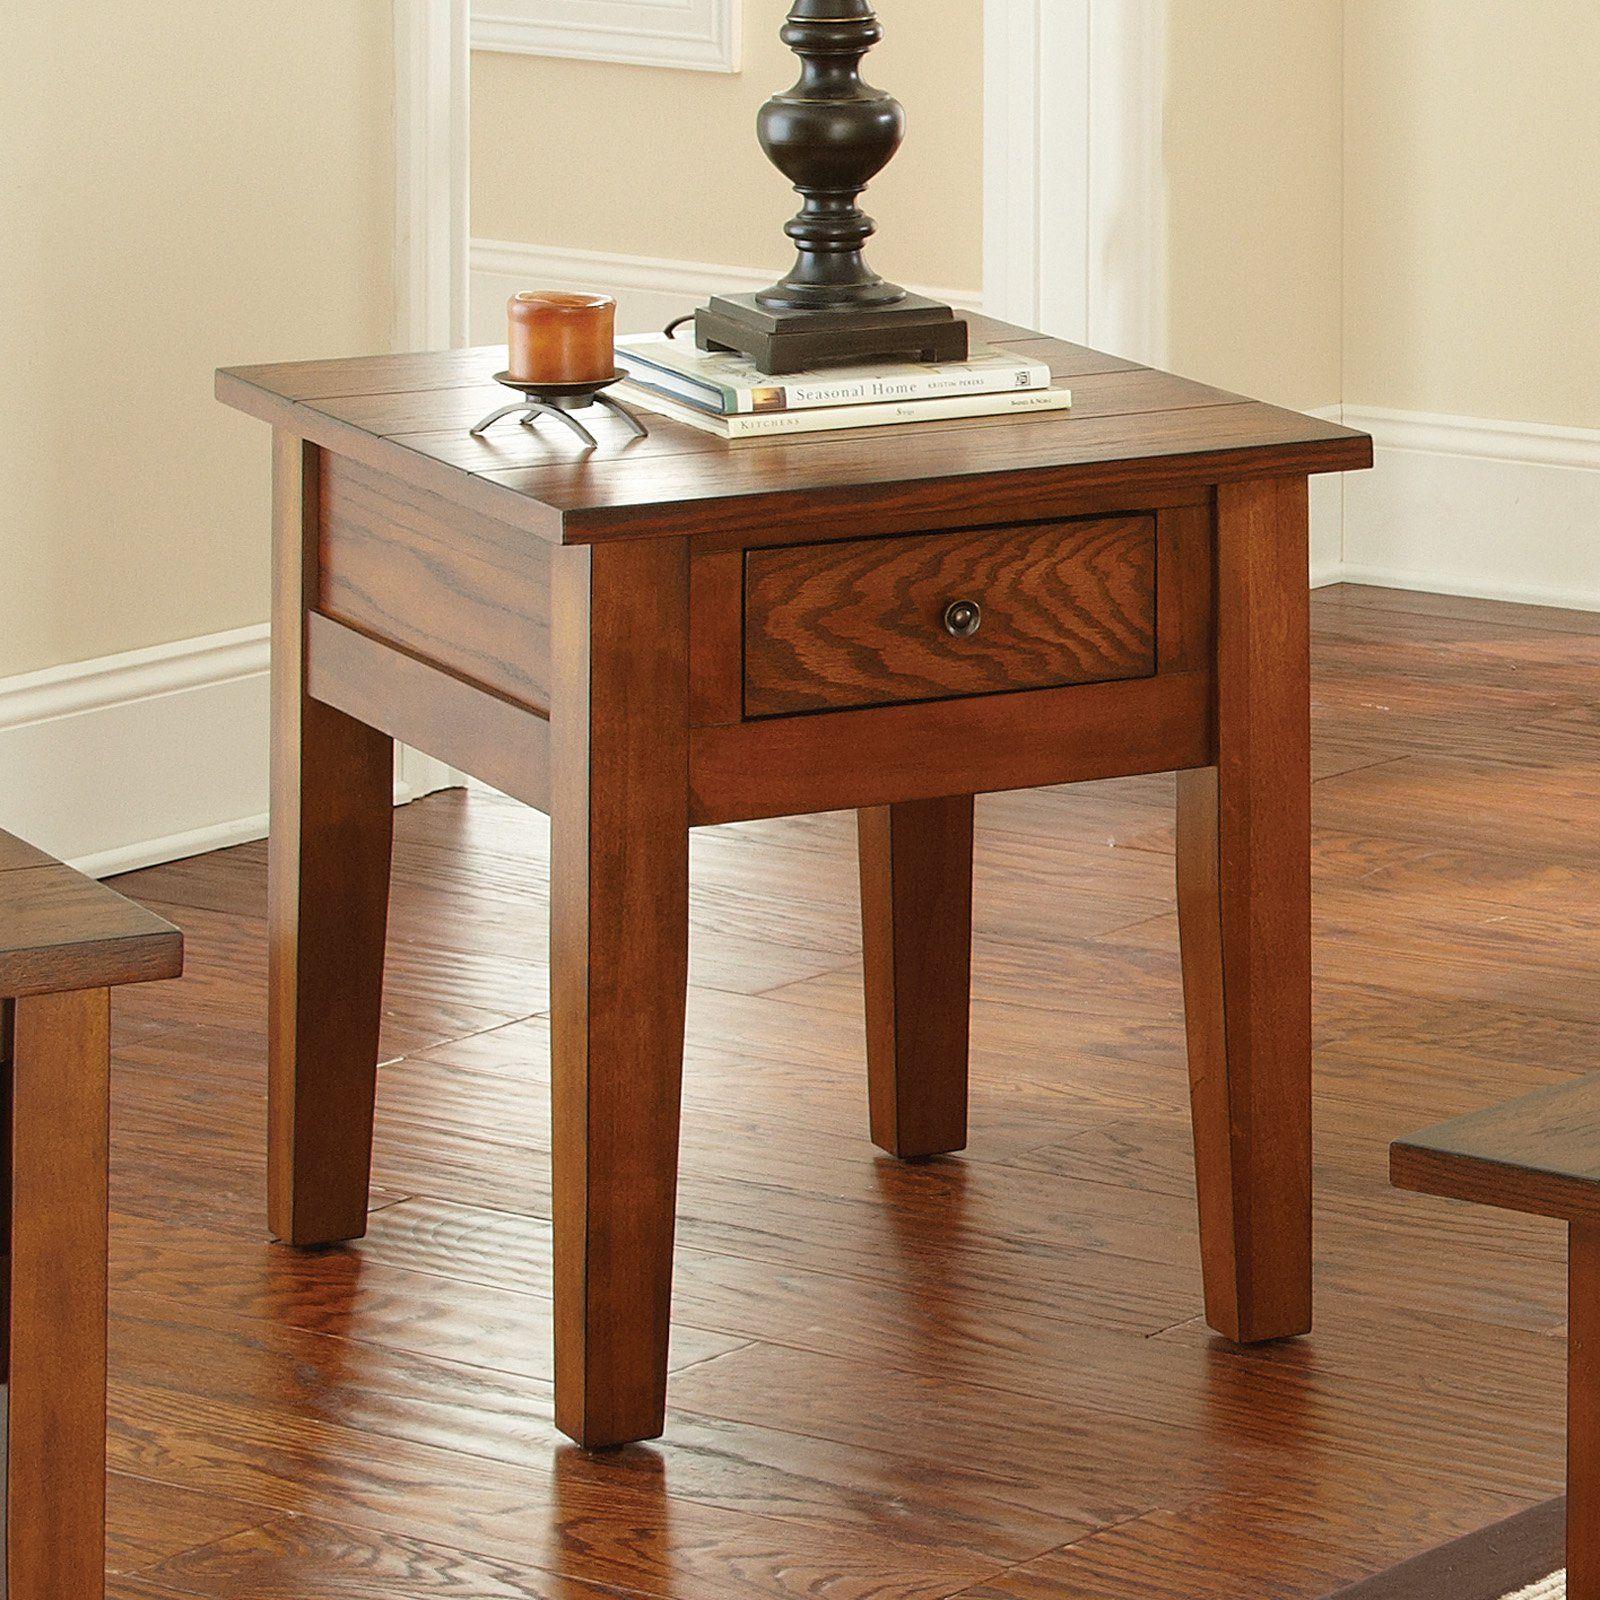 Steve Silver Desoto Rectangle Dark Oak Wood End Table Wood End Tables End Tables End Tables With Drawers